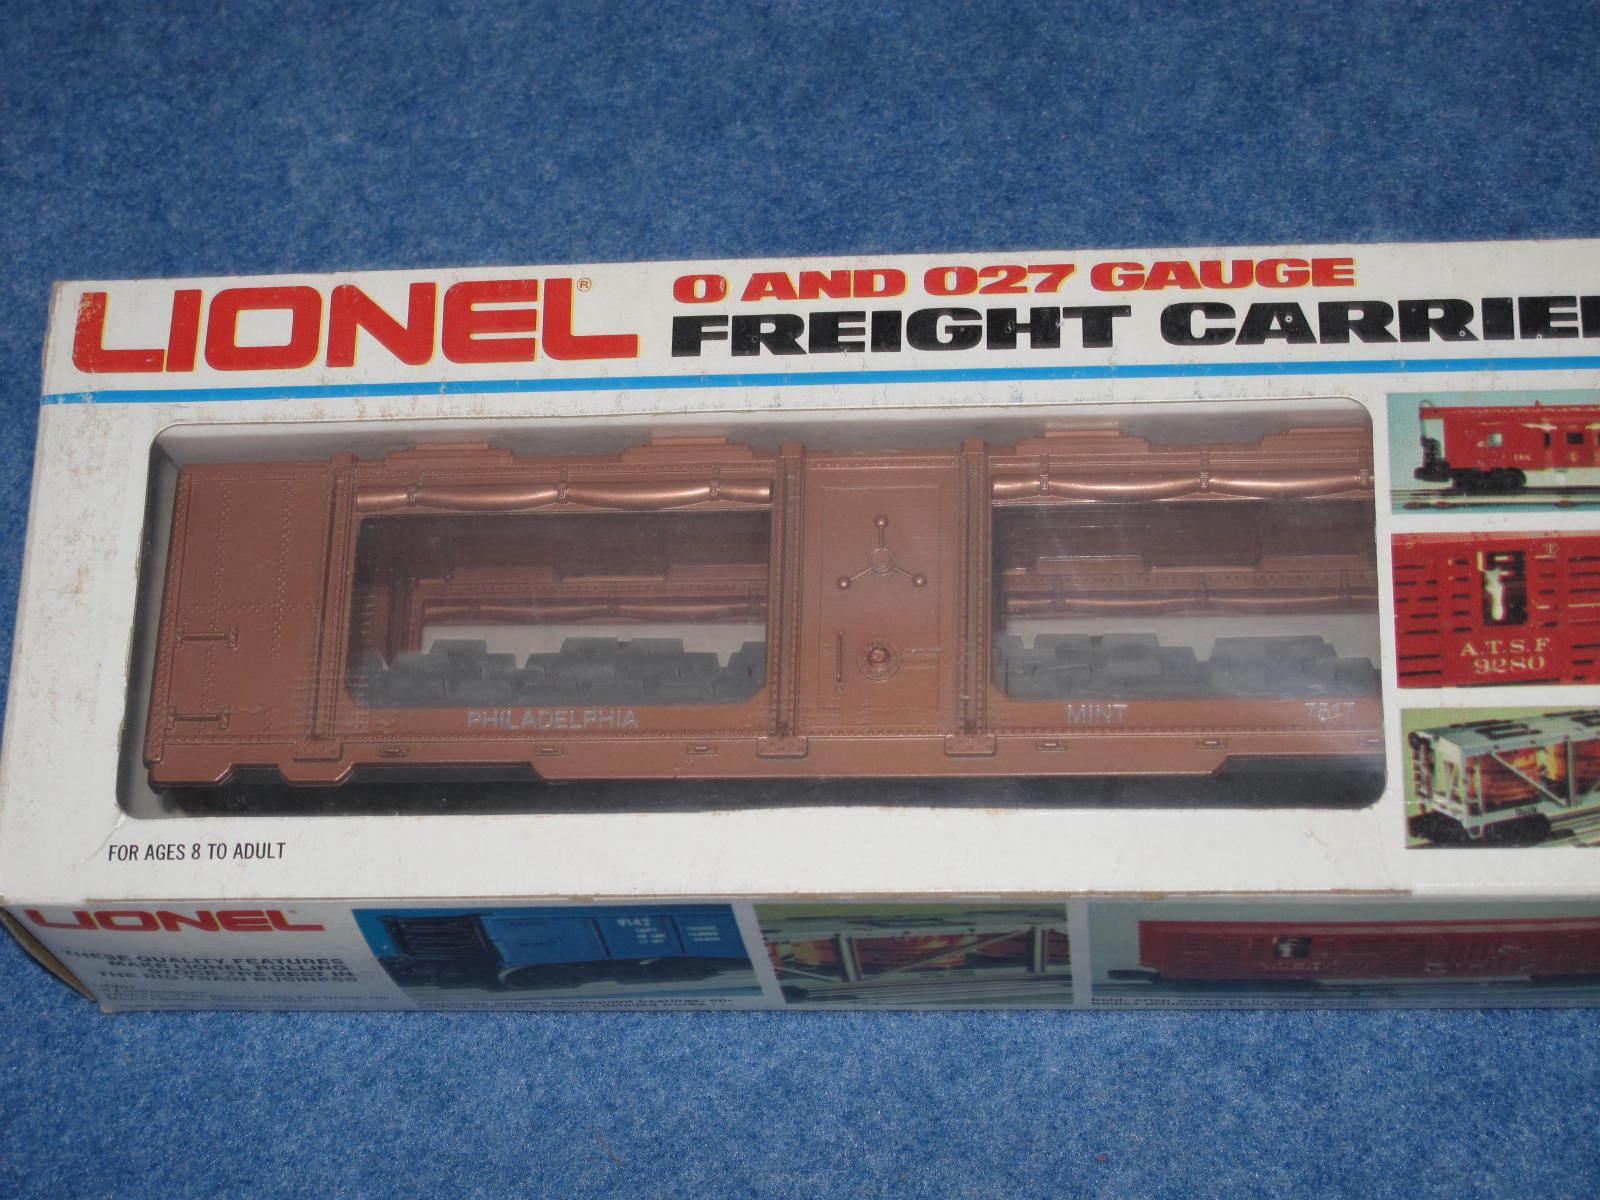 1982 Lionel 67517 Philadelphia Nuovo di zecca argentoo Auto L2241